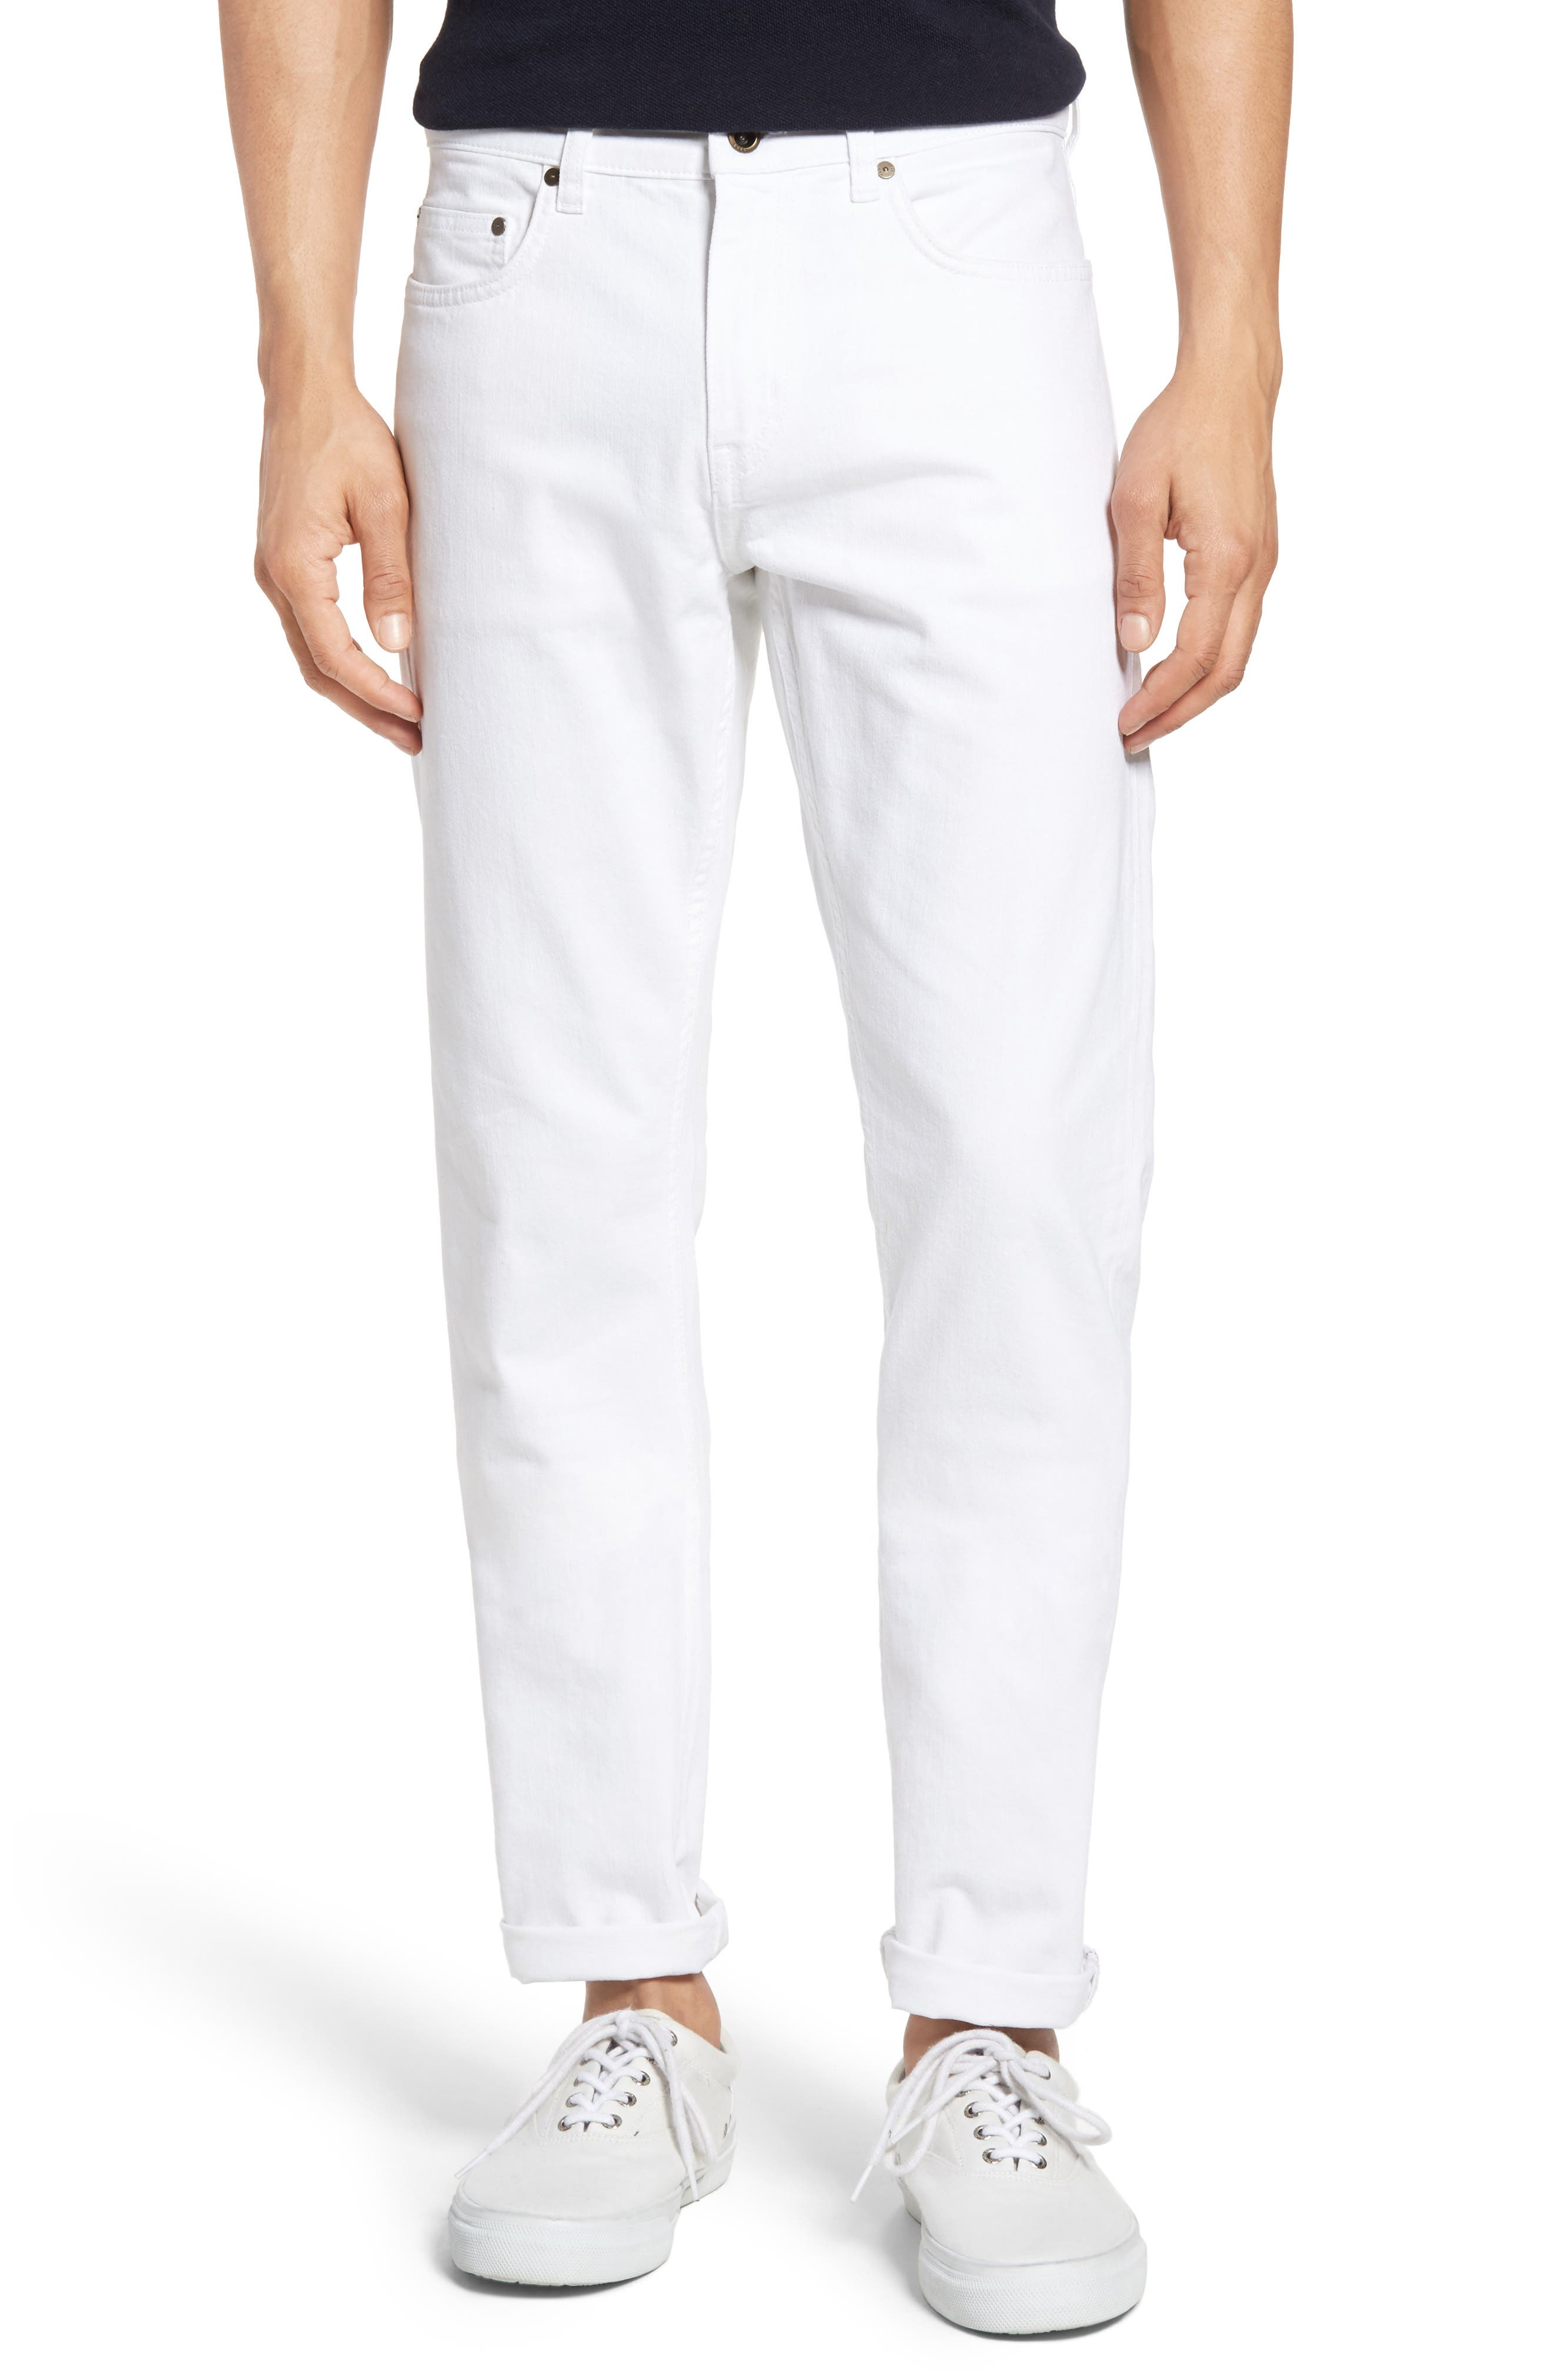 Allemand Straight Leg Jeans,                             Main thumbnail 1, color,                             Snow